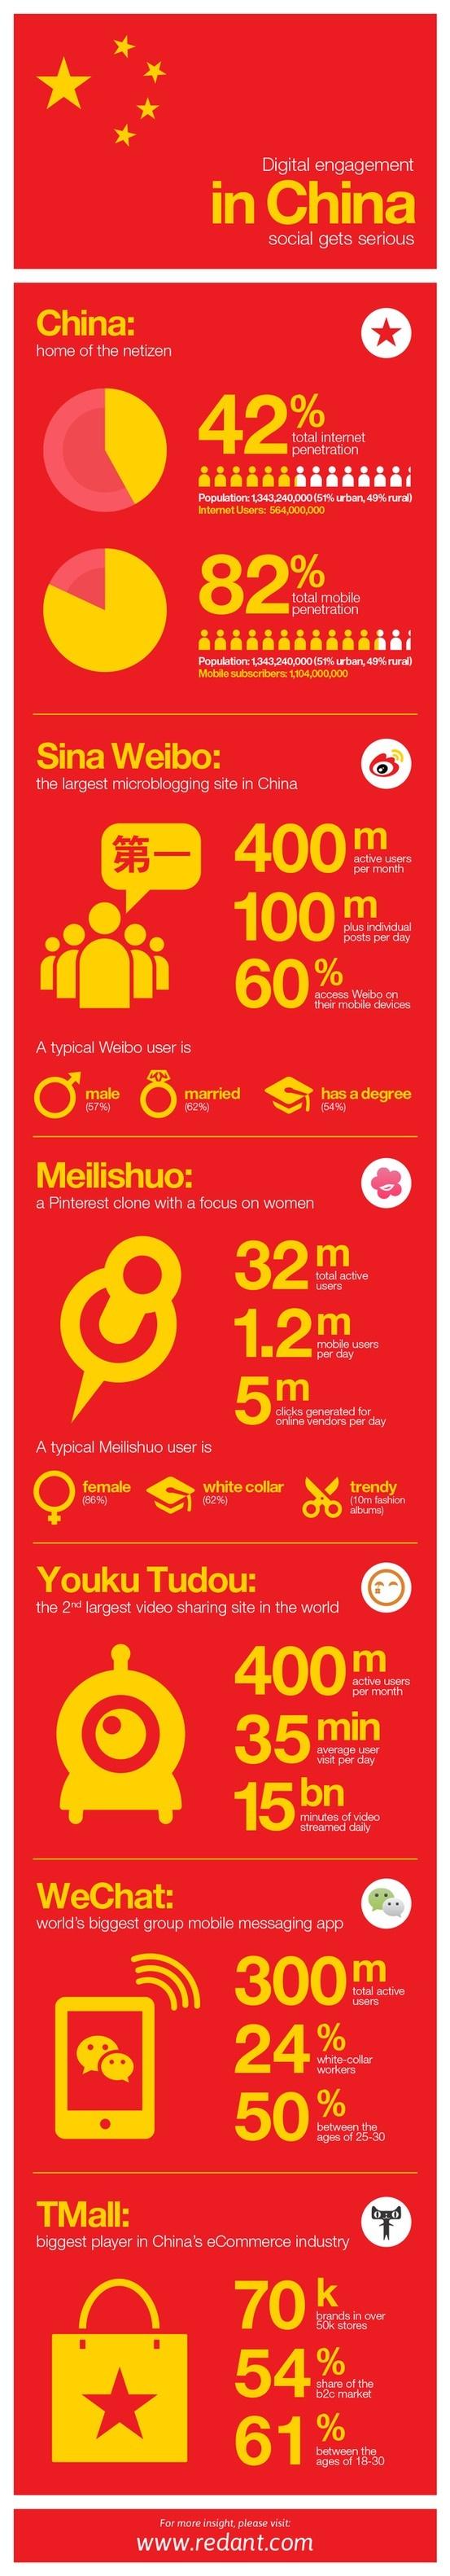 China - Digital Engagement #Asia #China #infographic